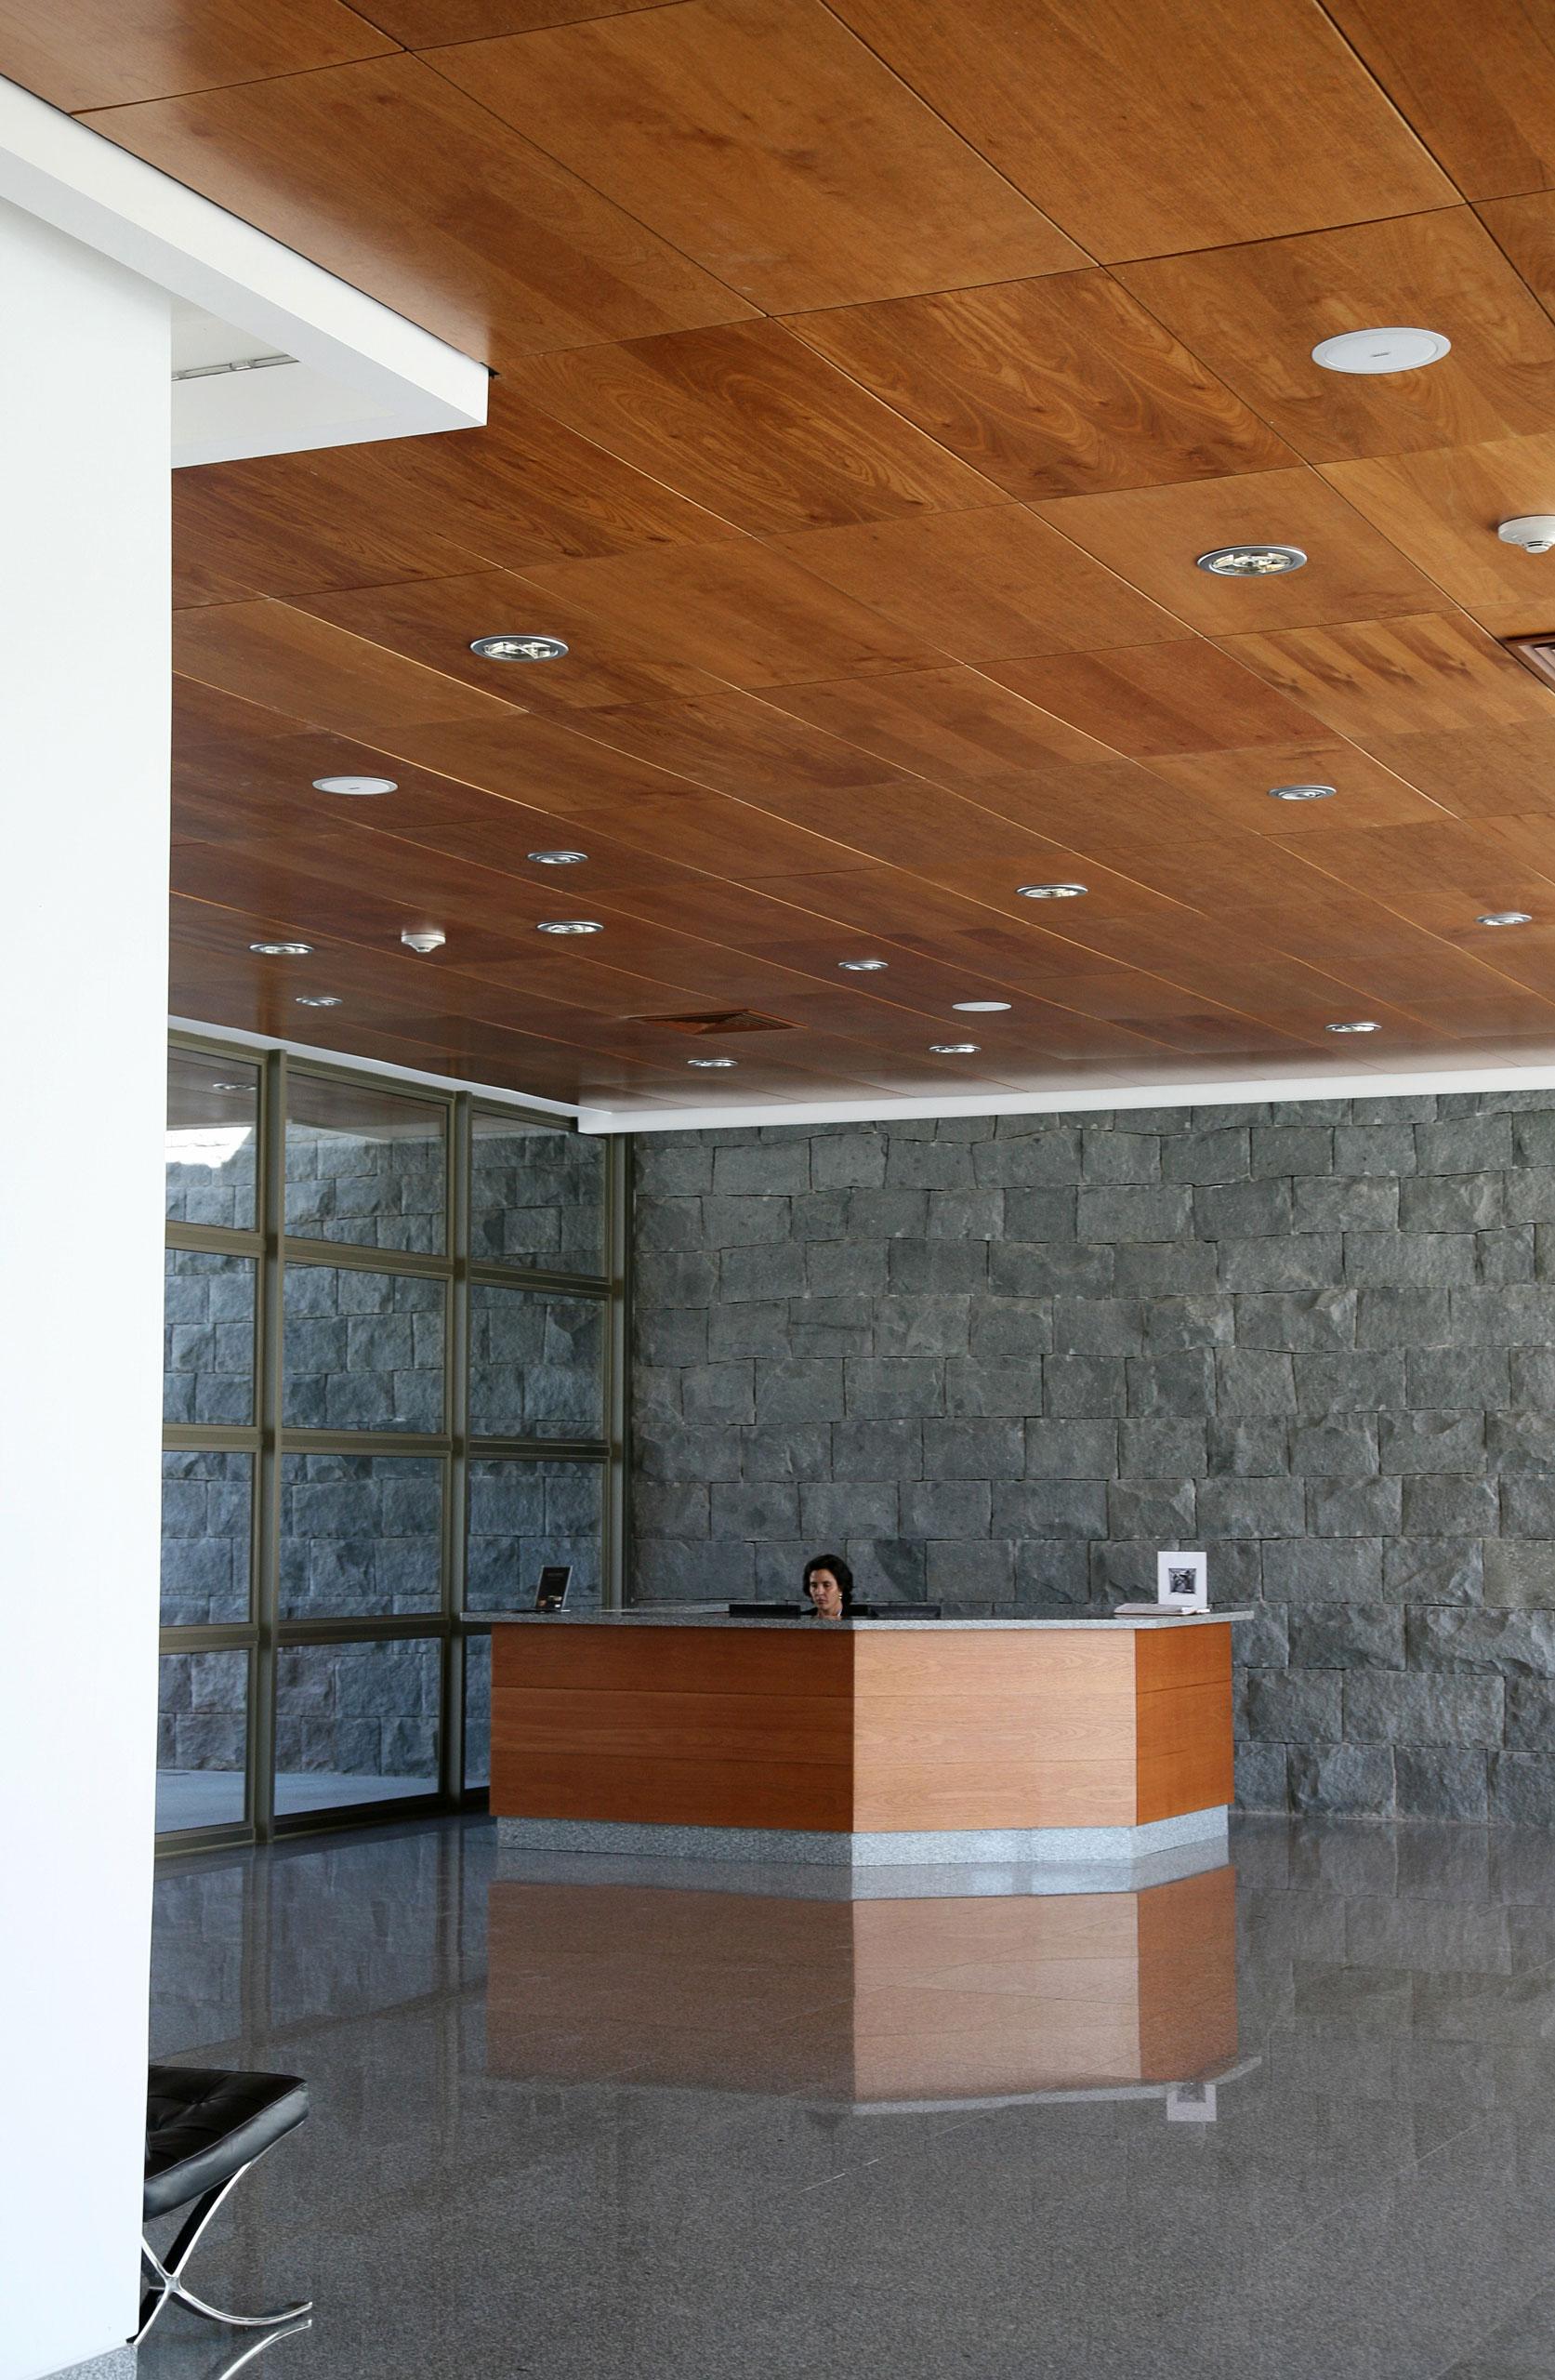 Natura basa arquitectura y dise o for Plafones de pared para escaleras